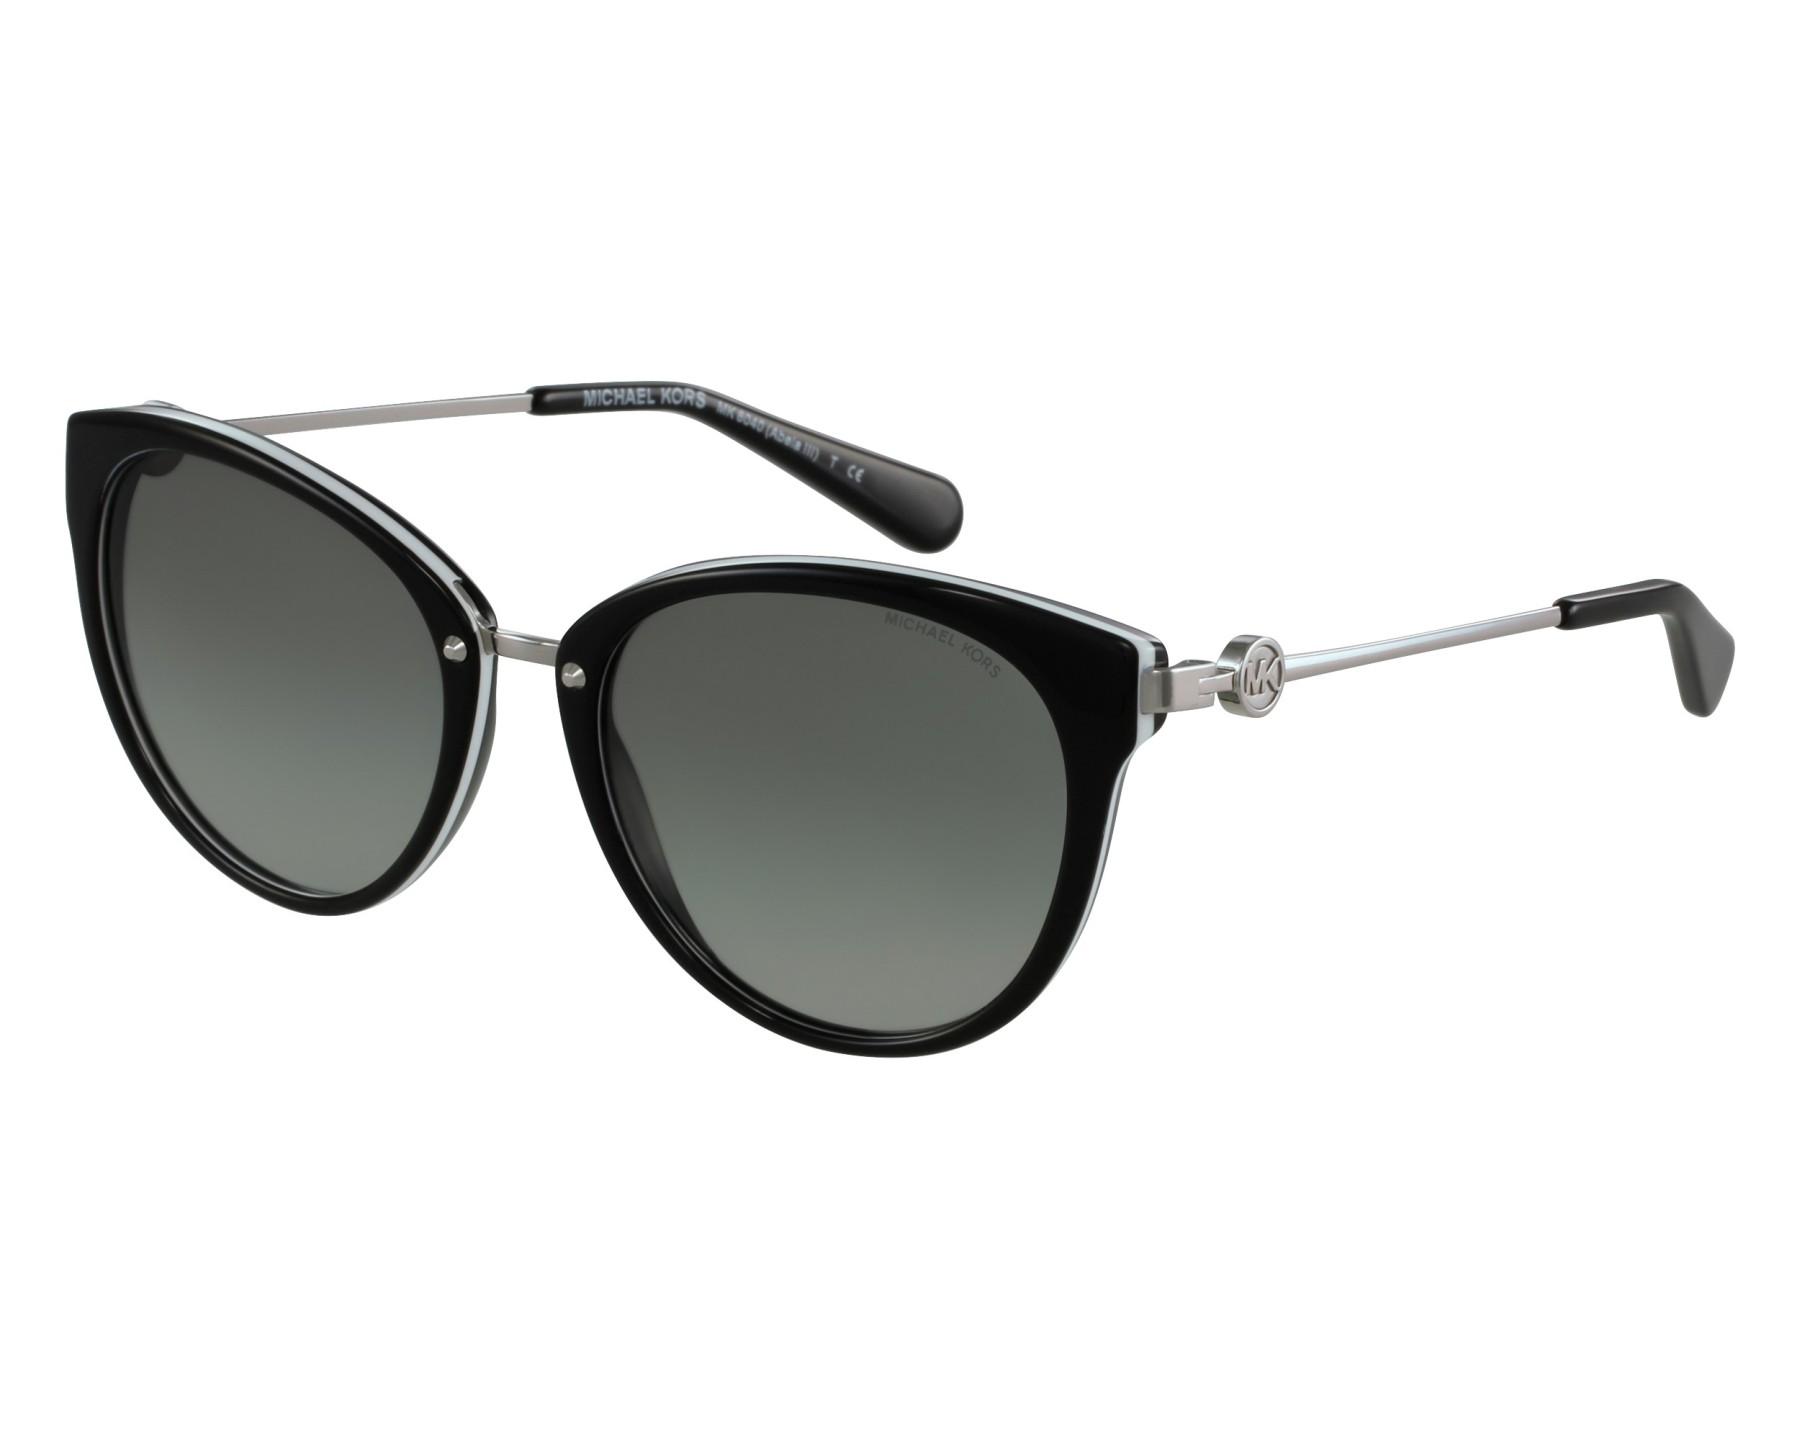 9c55d3f97f Sunglasses Michael Kors MK-6040 312911 55-19 Black Silver front view